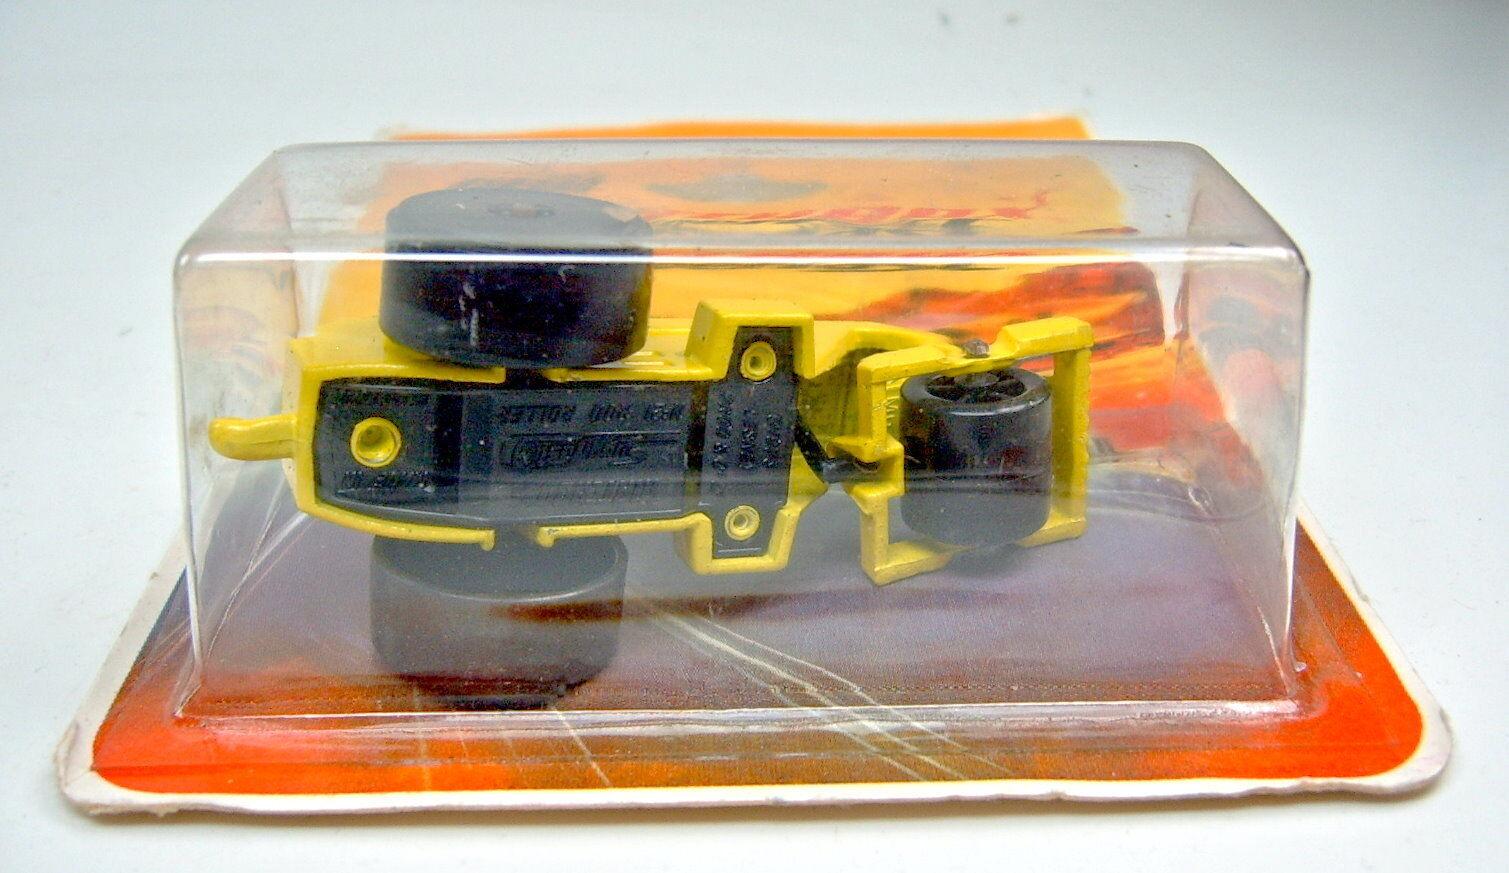 Matchbox SF Nr. 21B Rod Roller yellow blacke blacke blacke Bodenplatte top im Blister 850f67